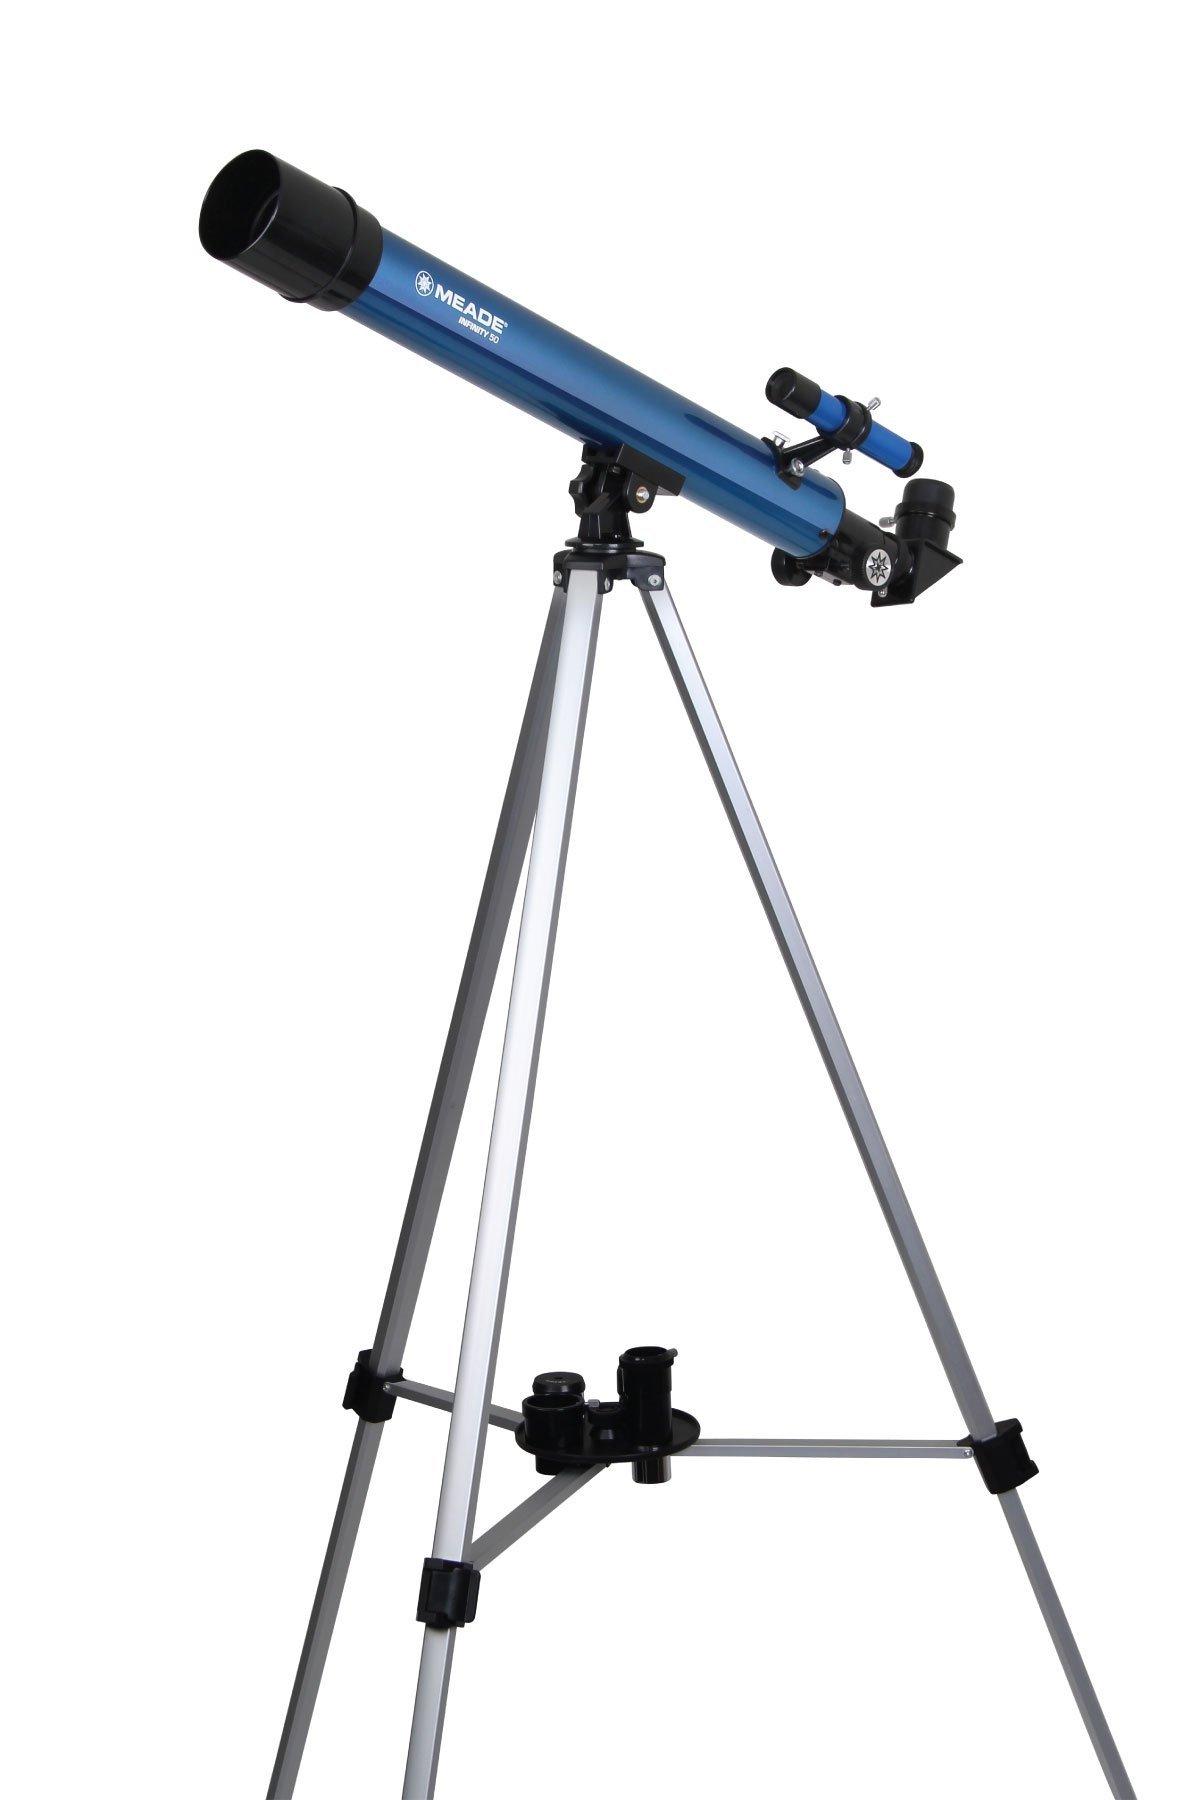 Meade Instruments Infinity 50mm AZ Refractor Telescope (Renewed) by Meade Instruments